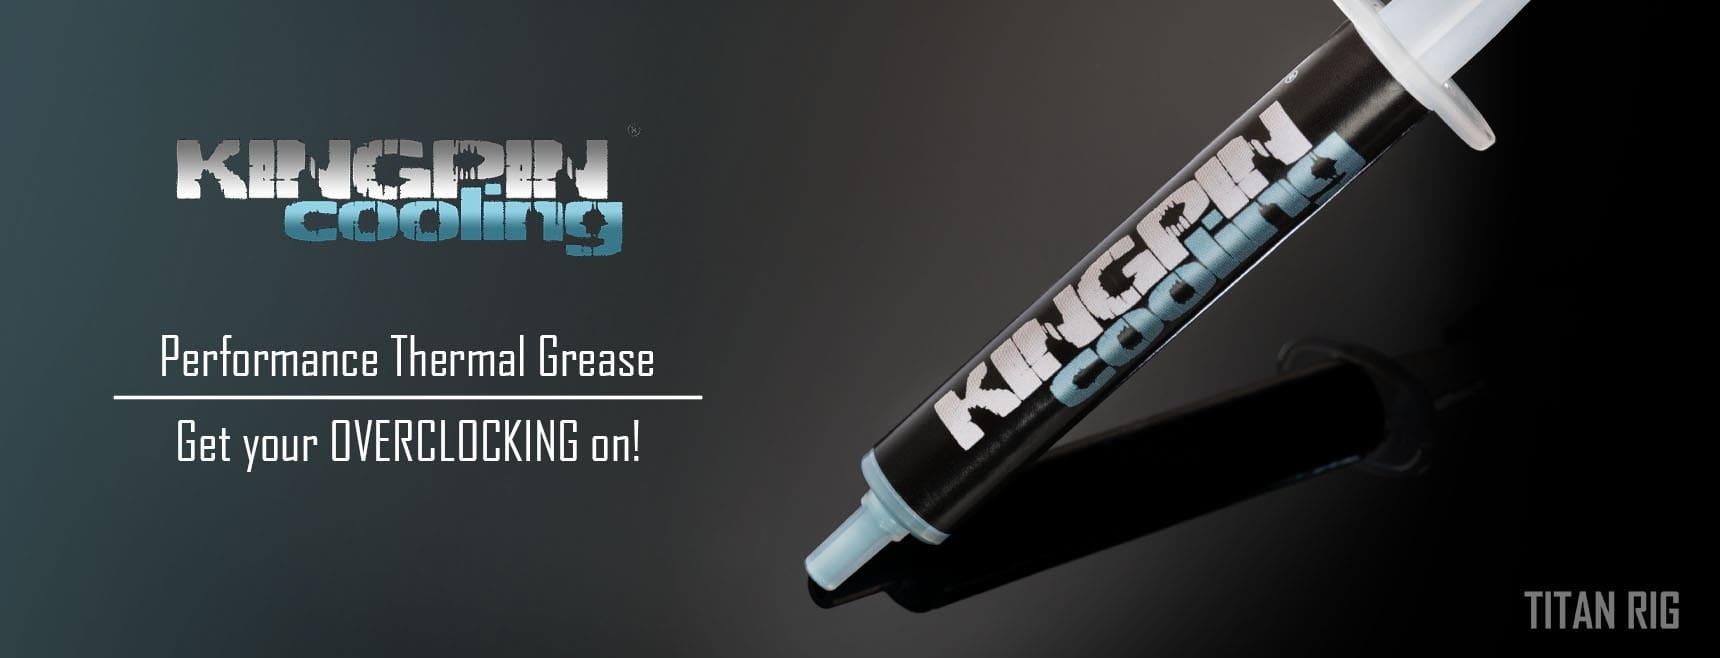 Kingpin cooling kpx thermal grease